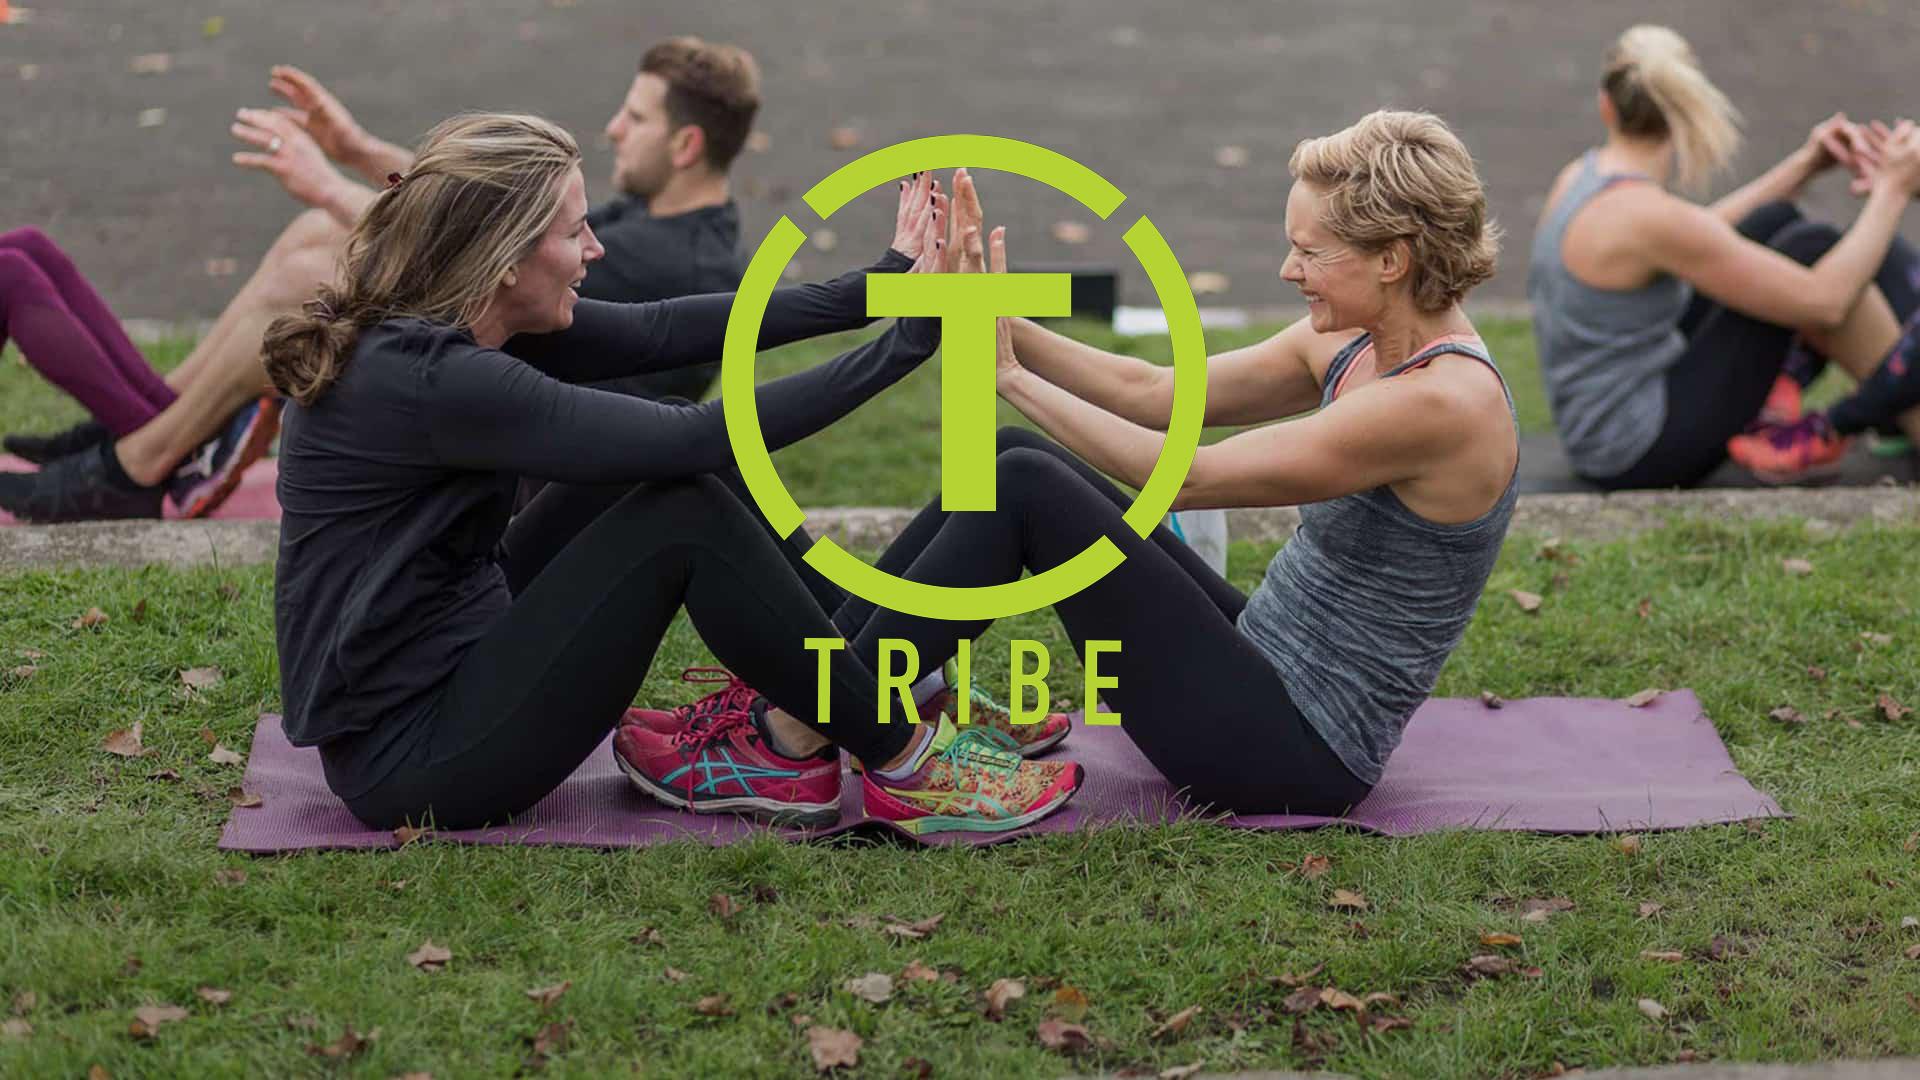 TribeLDN Fitness